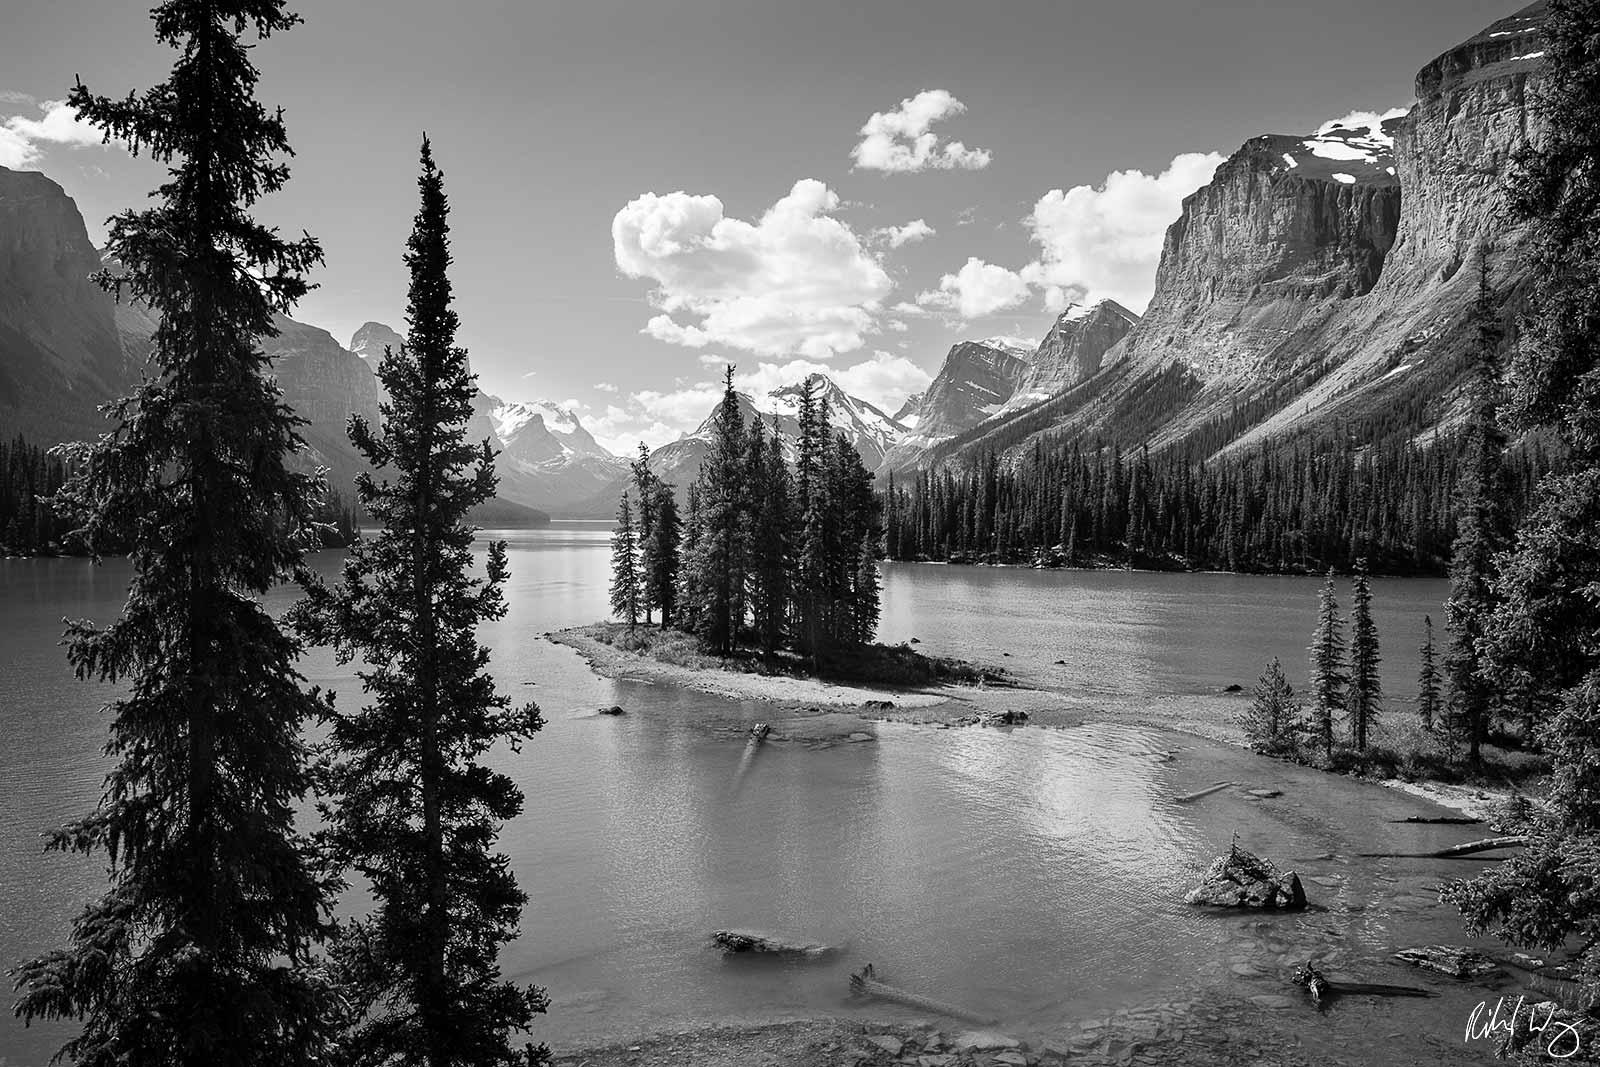 Black and White Photo: Spirit Island Overlook at Maligne Lake, Jasper National Park, Alberta, Canada